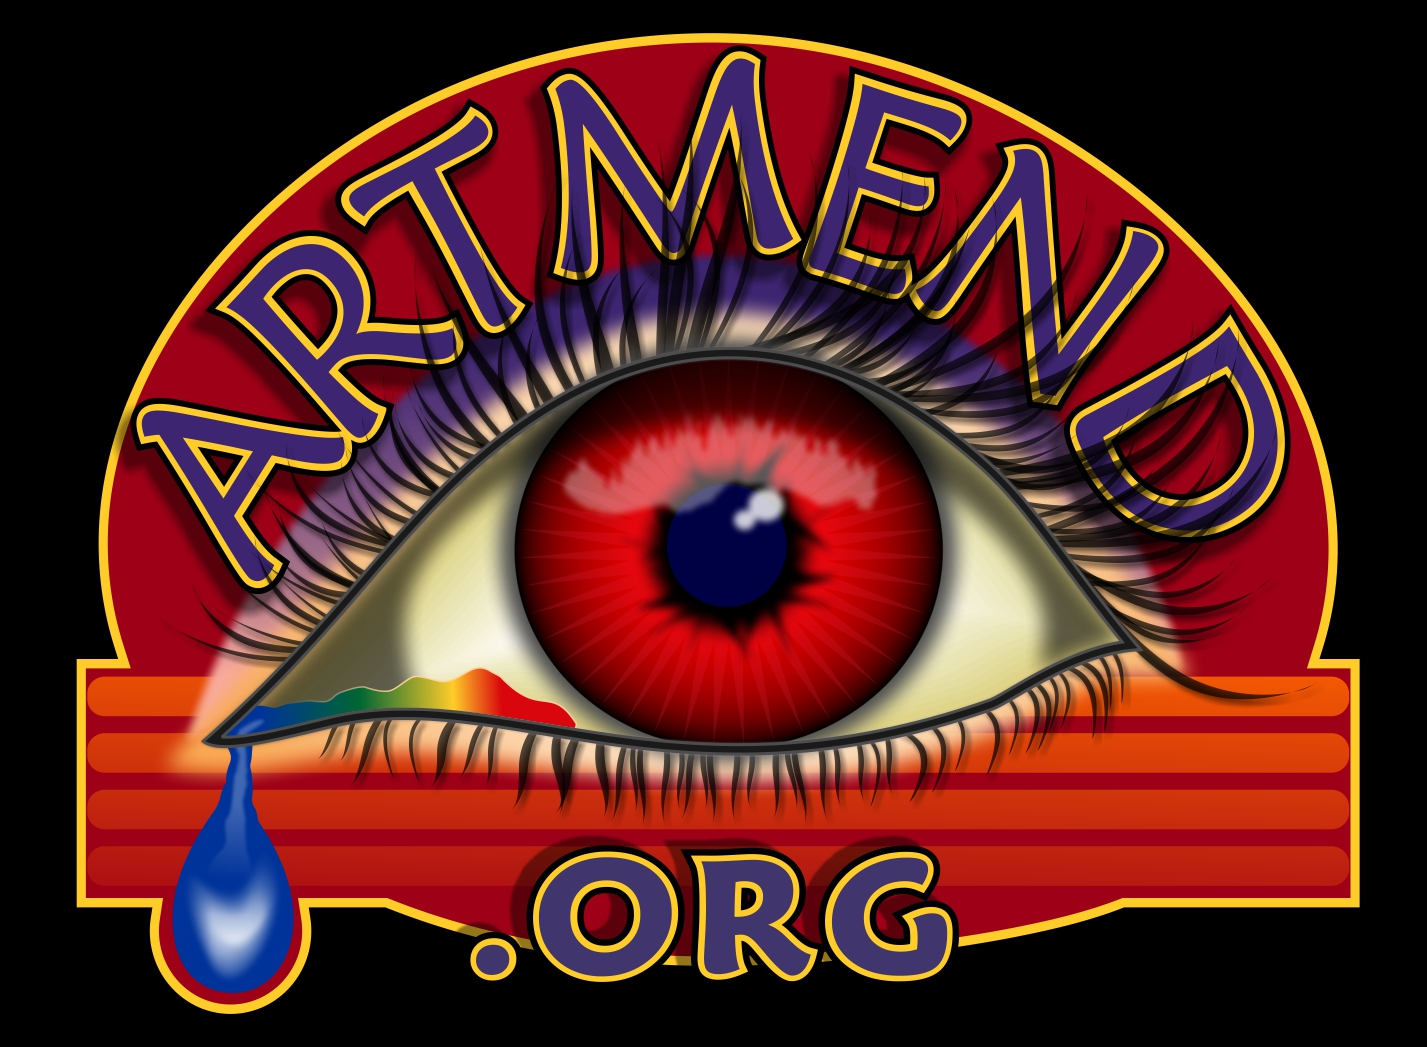 artmend_org_logo.jpg